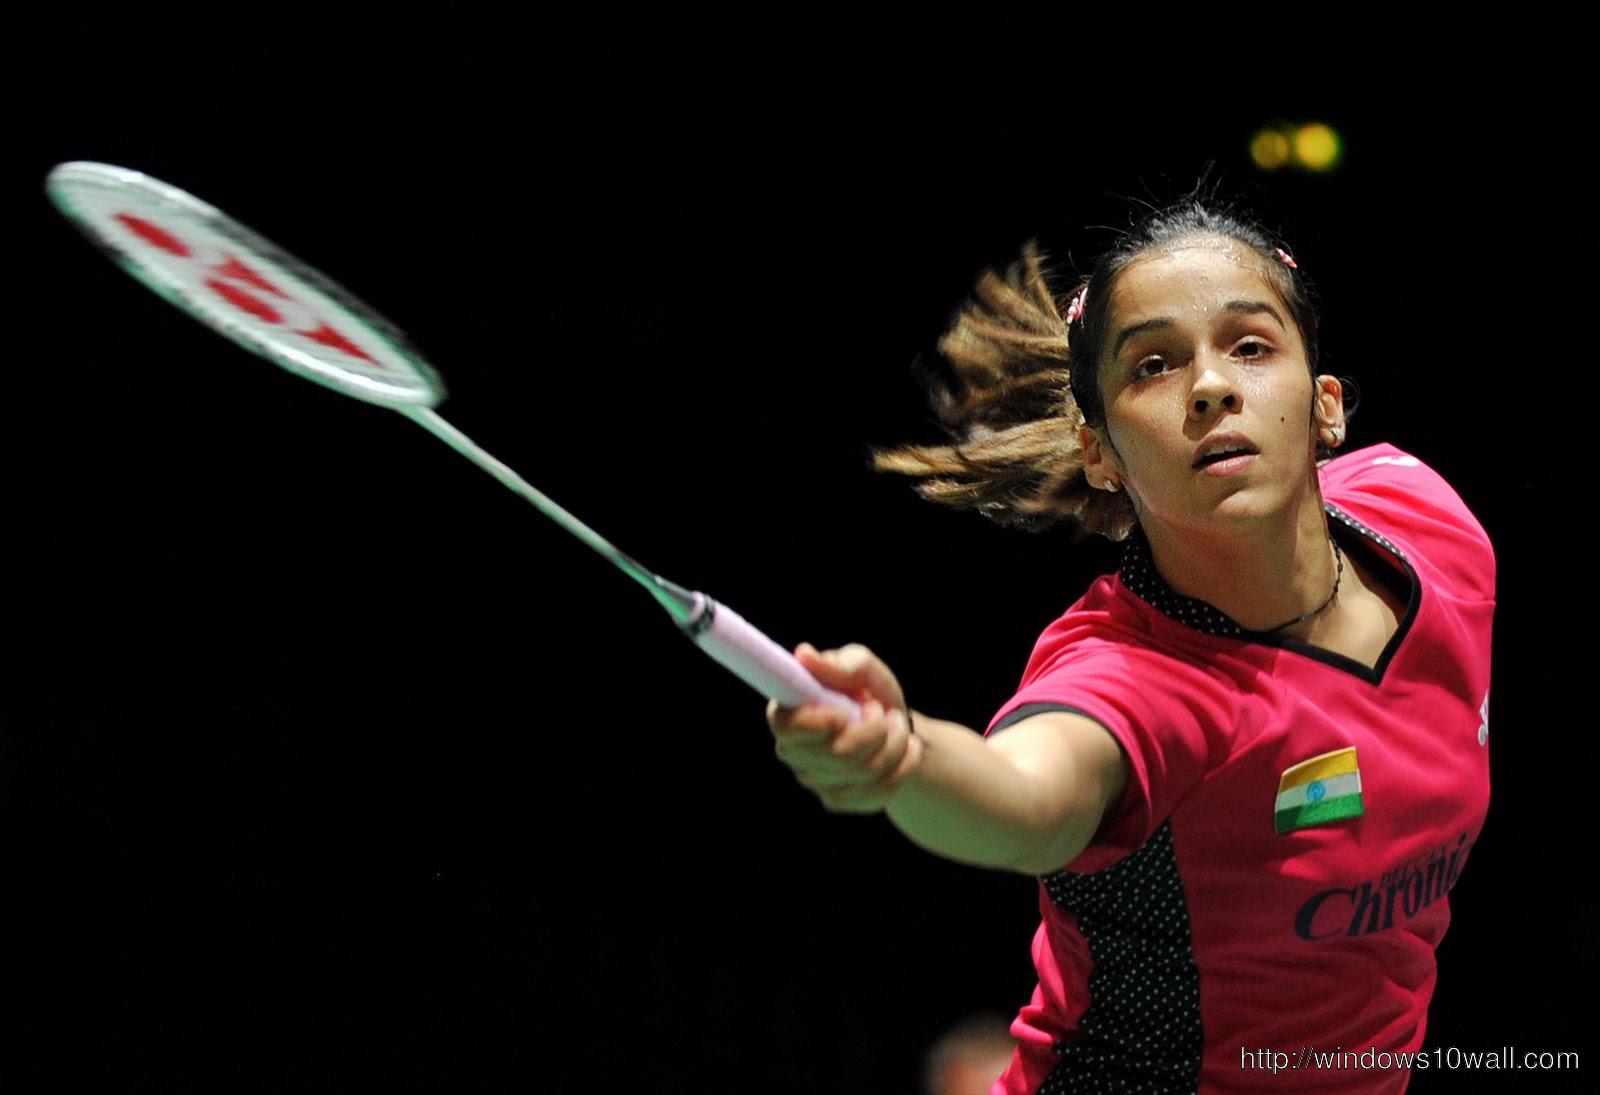 Saina Nehwal With Racket Background Wallpaper